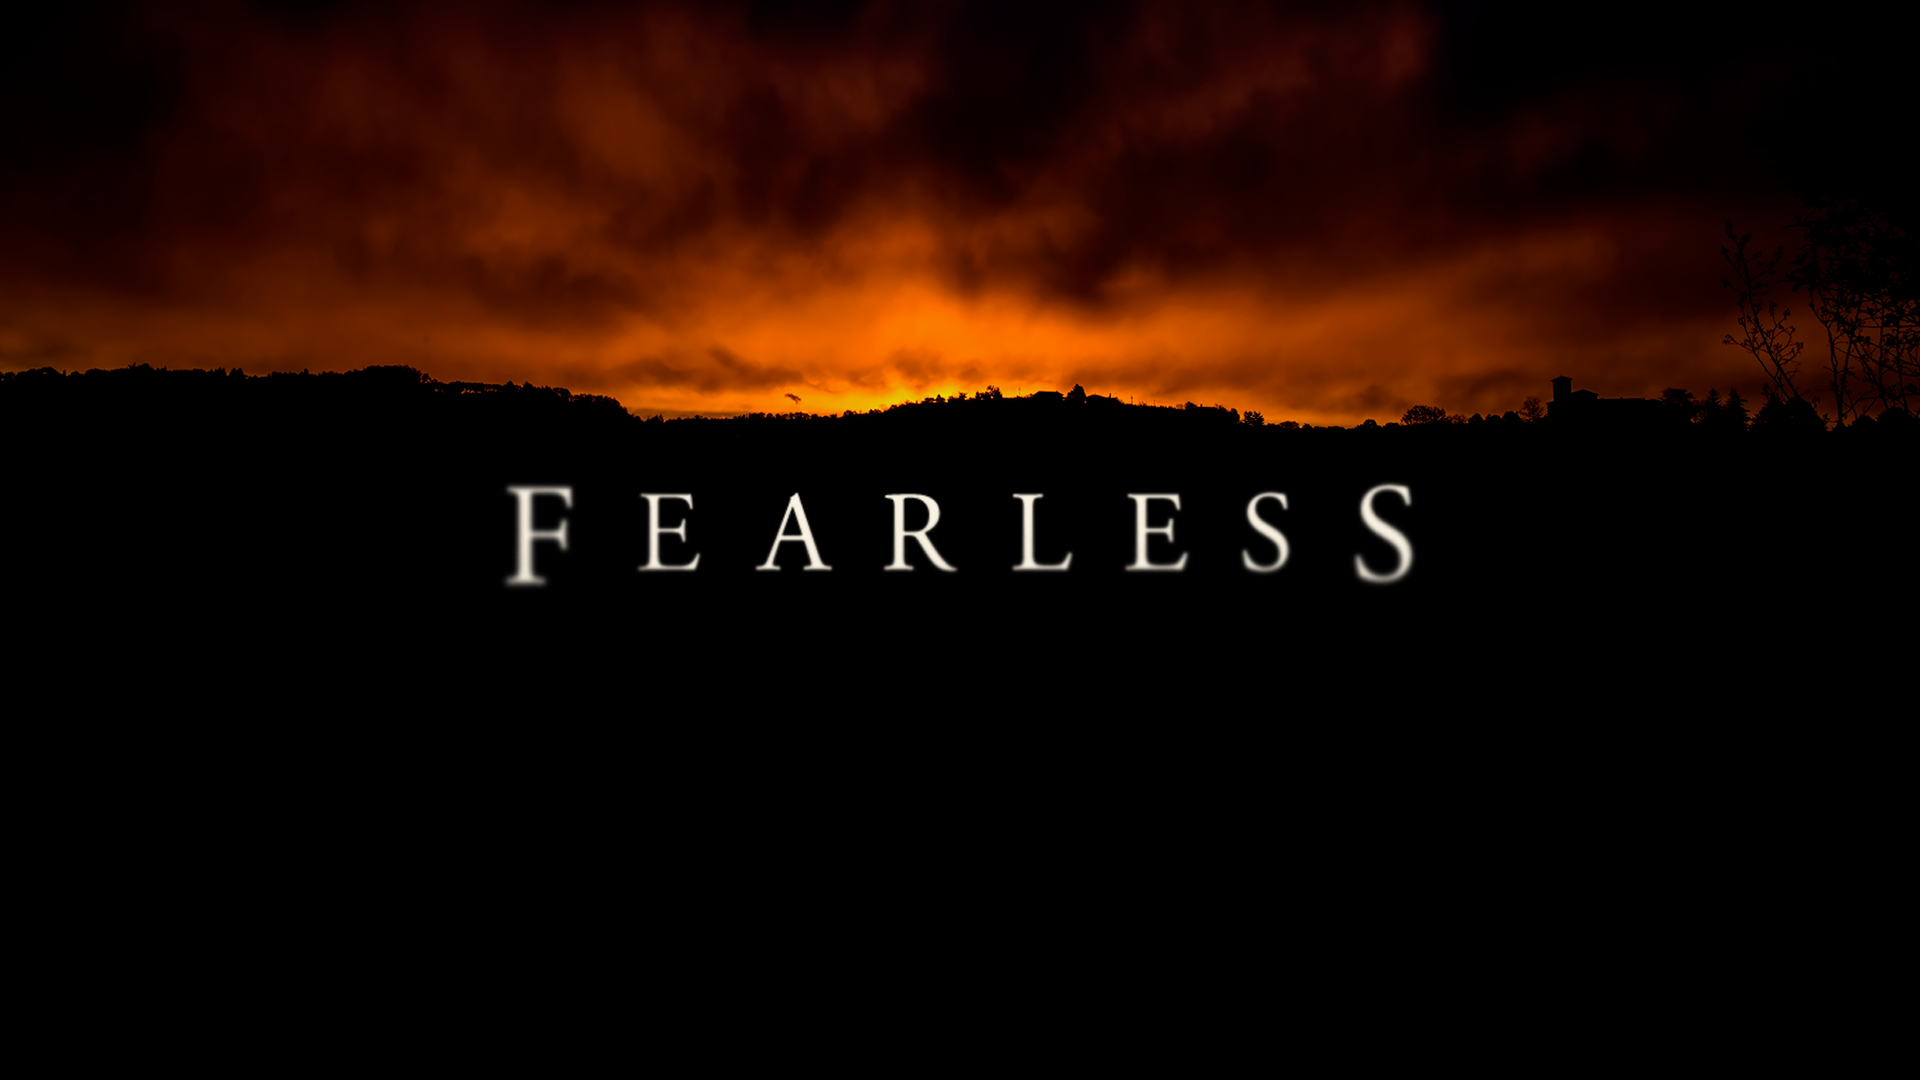 VINICIUS NALDI - A_Fearless_Heart_vinicius_Dir1_38